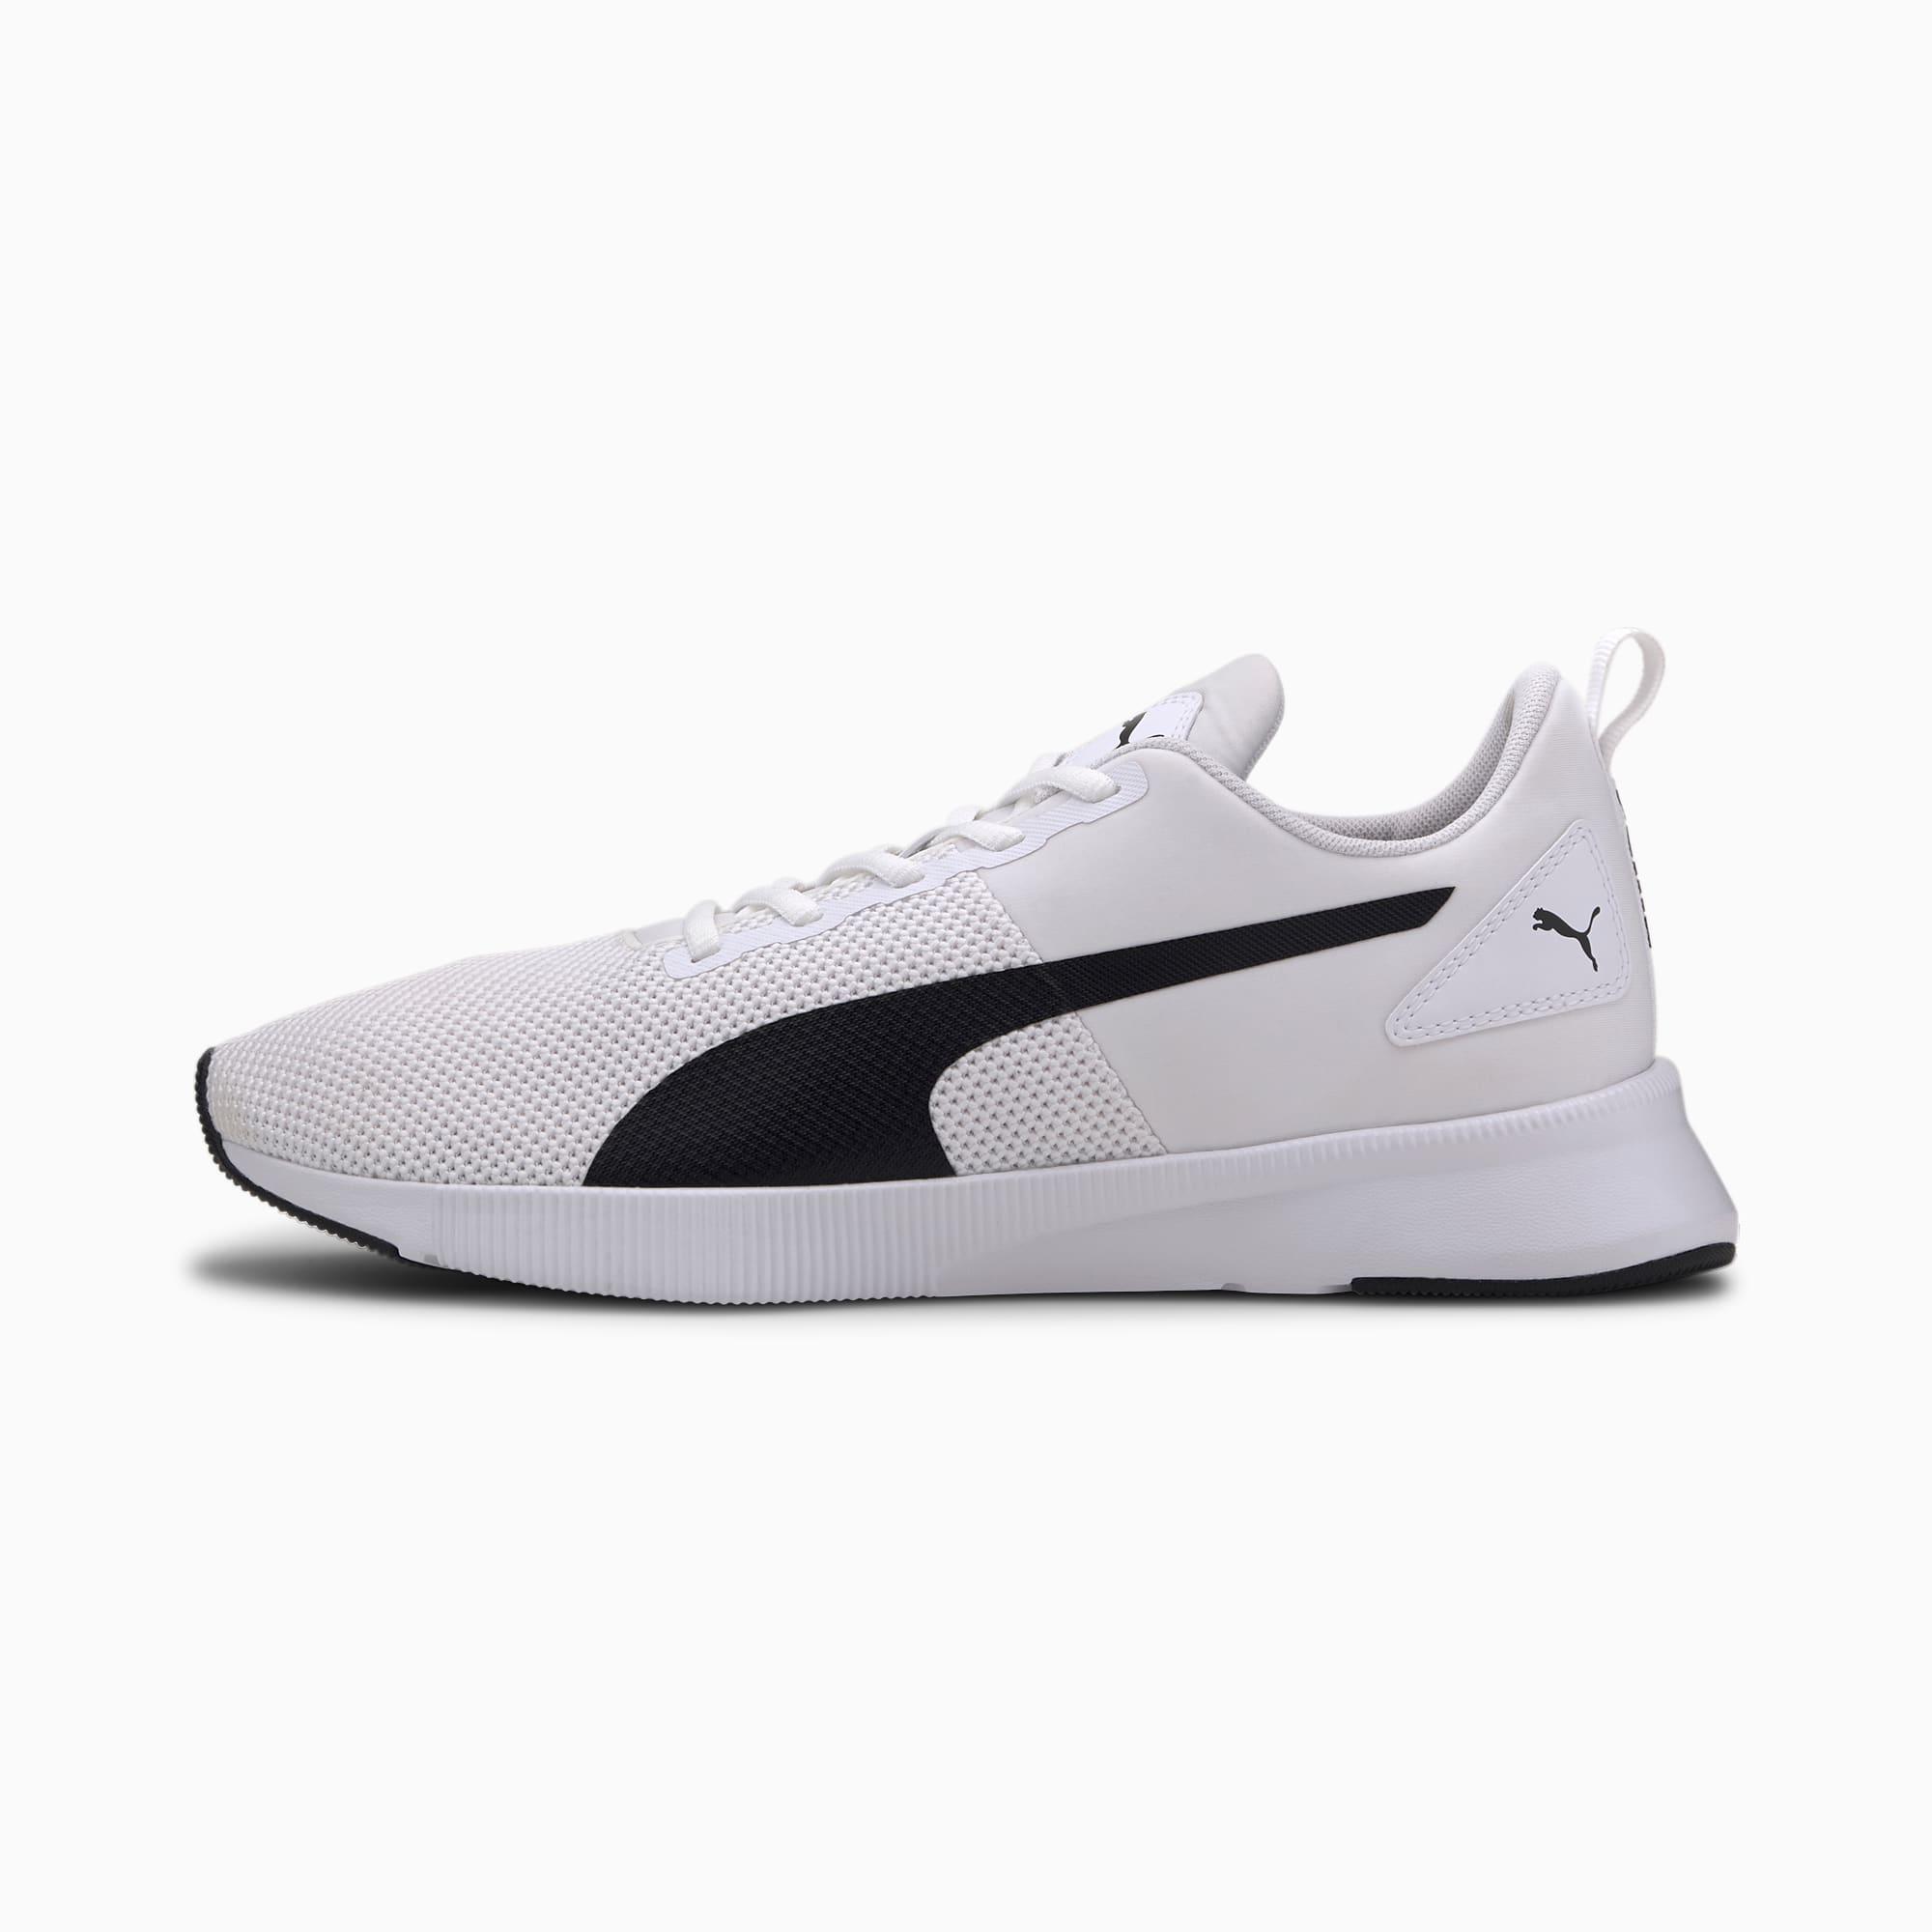 PUMA Chaussure de course Flyer Runner, Blanc/Noir, Taille 35.5, Chaussures